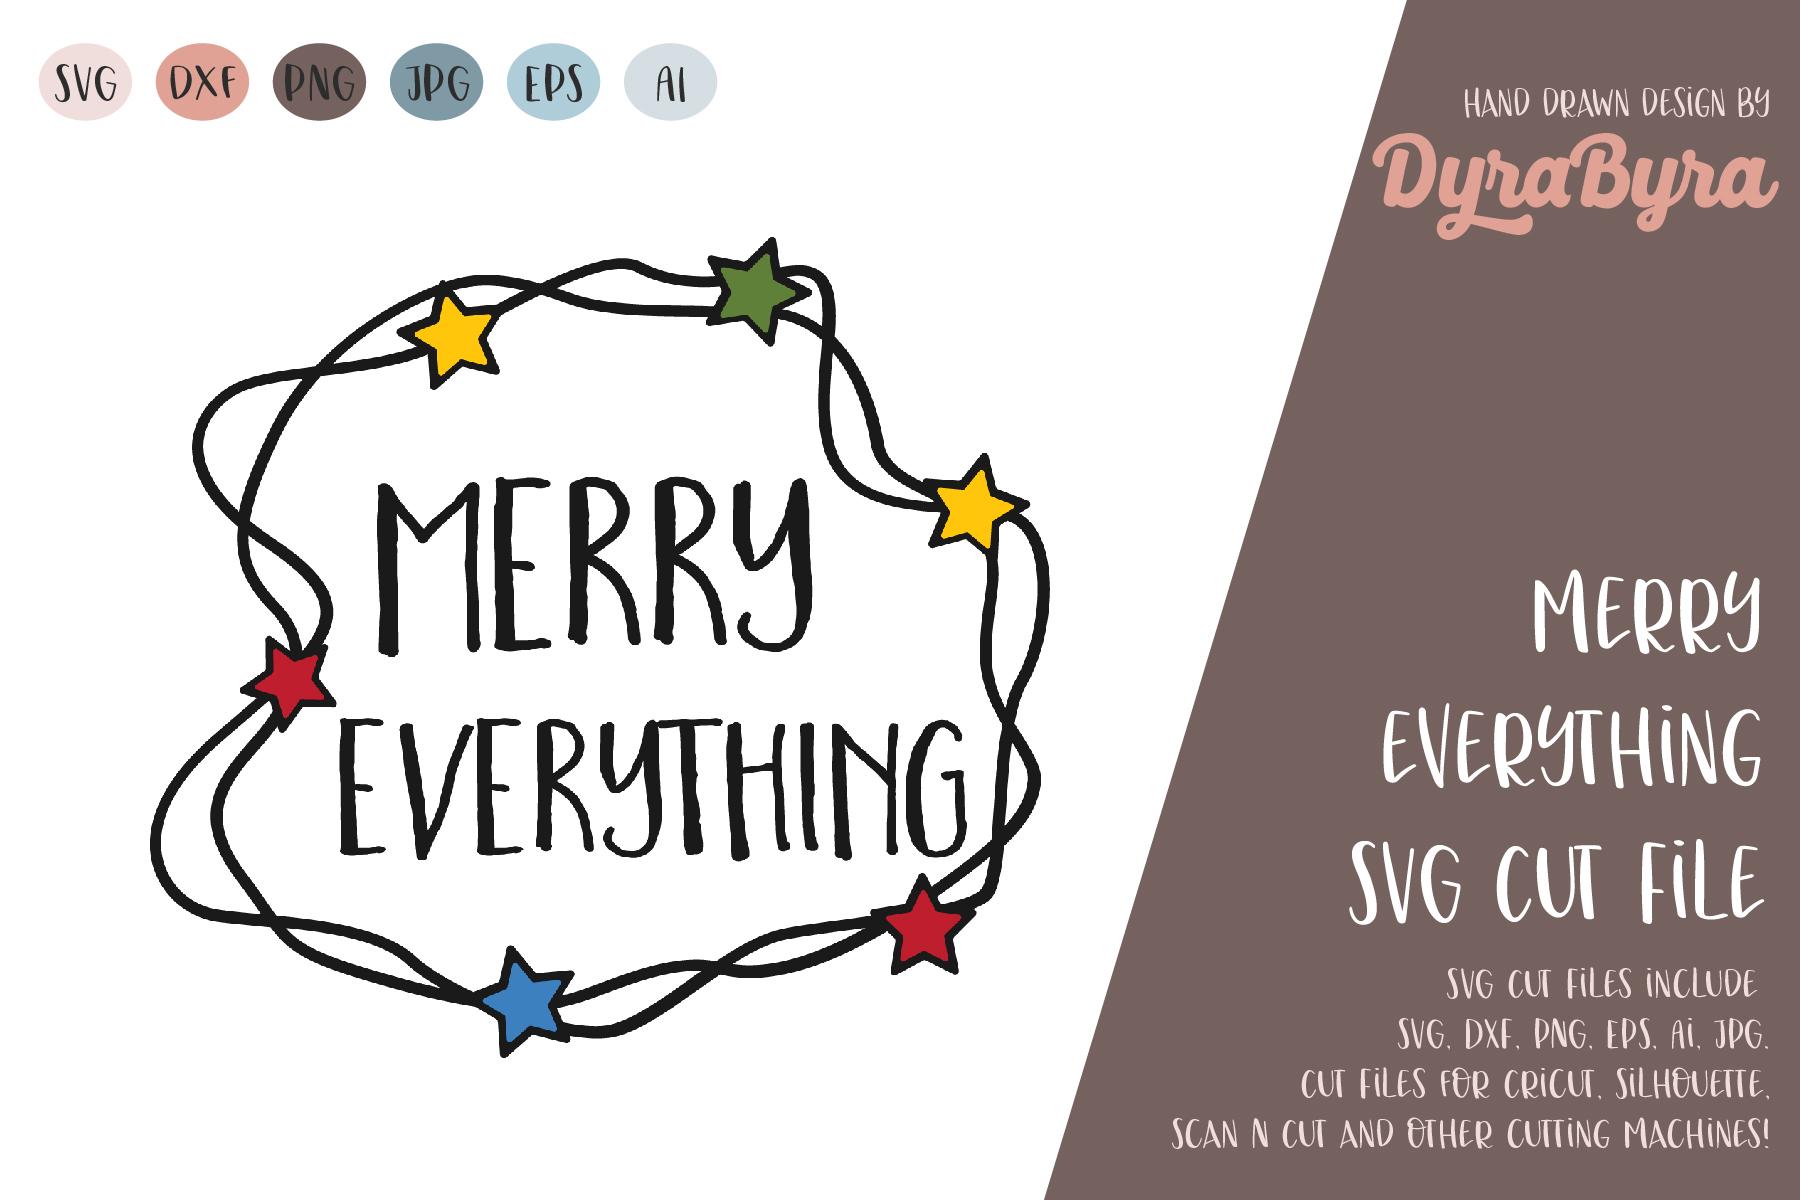 Merry Everything SVG / Christmas Lights SVG / Xmas example image 2